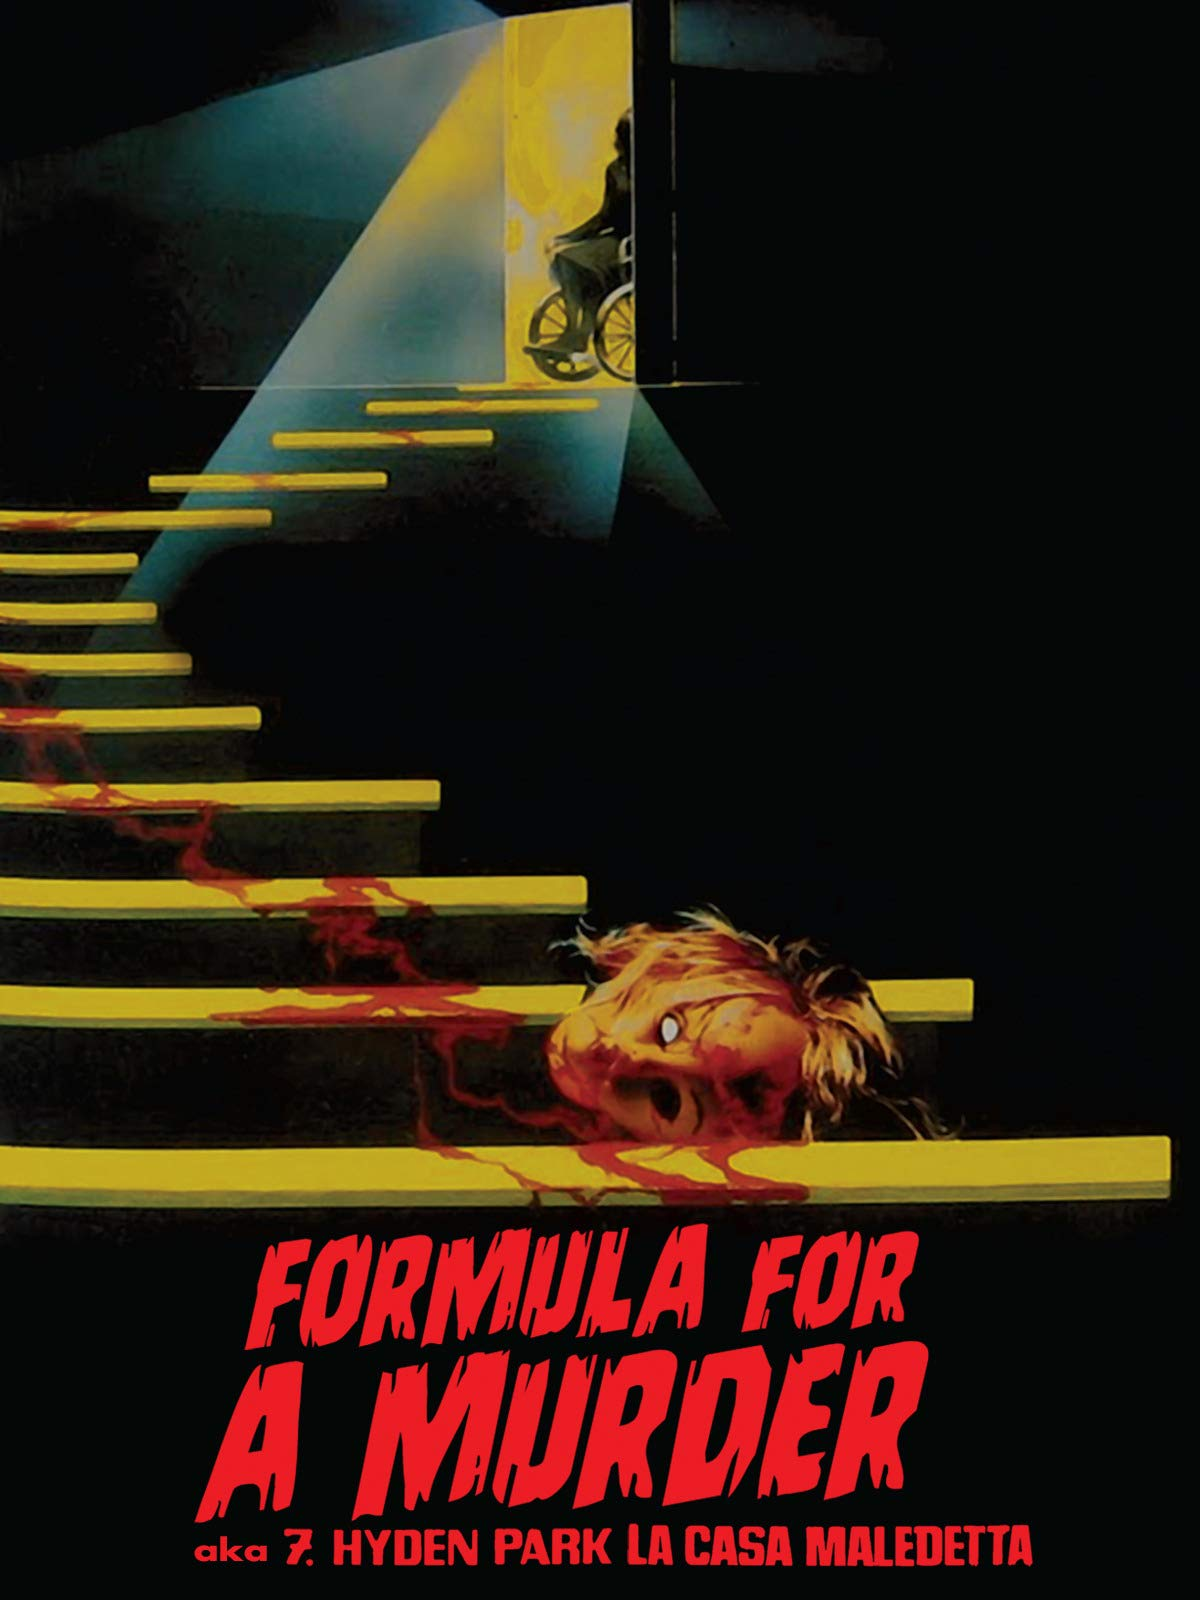 A Formula for a murder